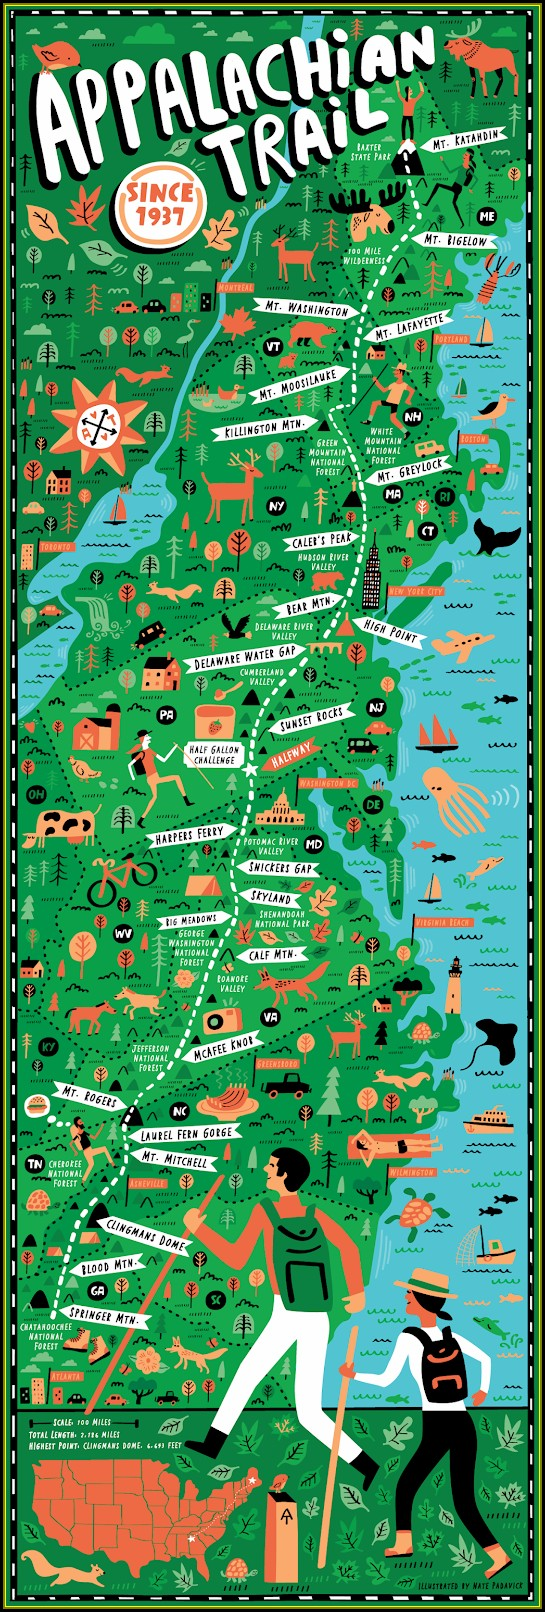 Maps Of The Appalachian Trail